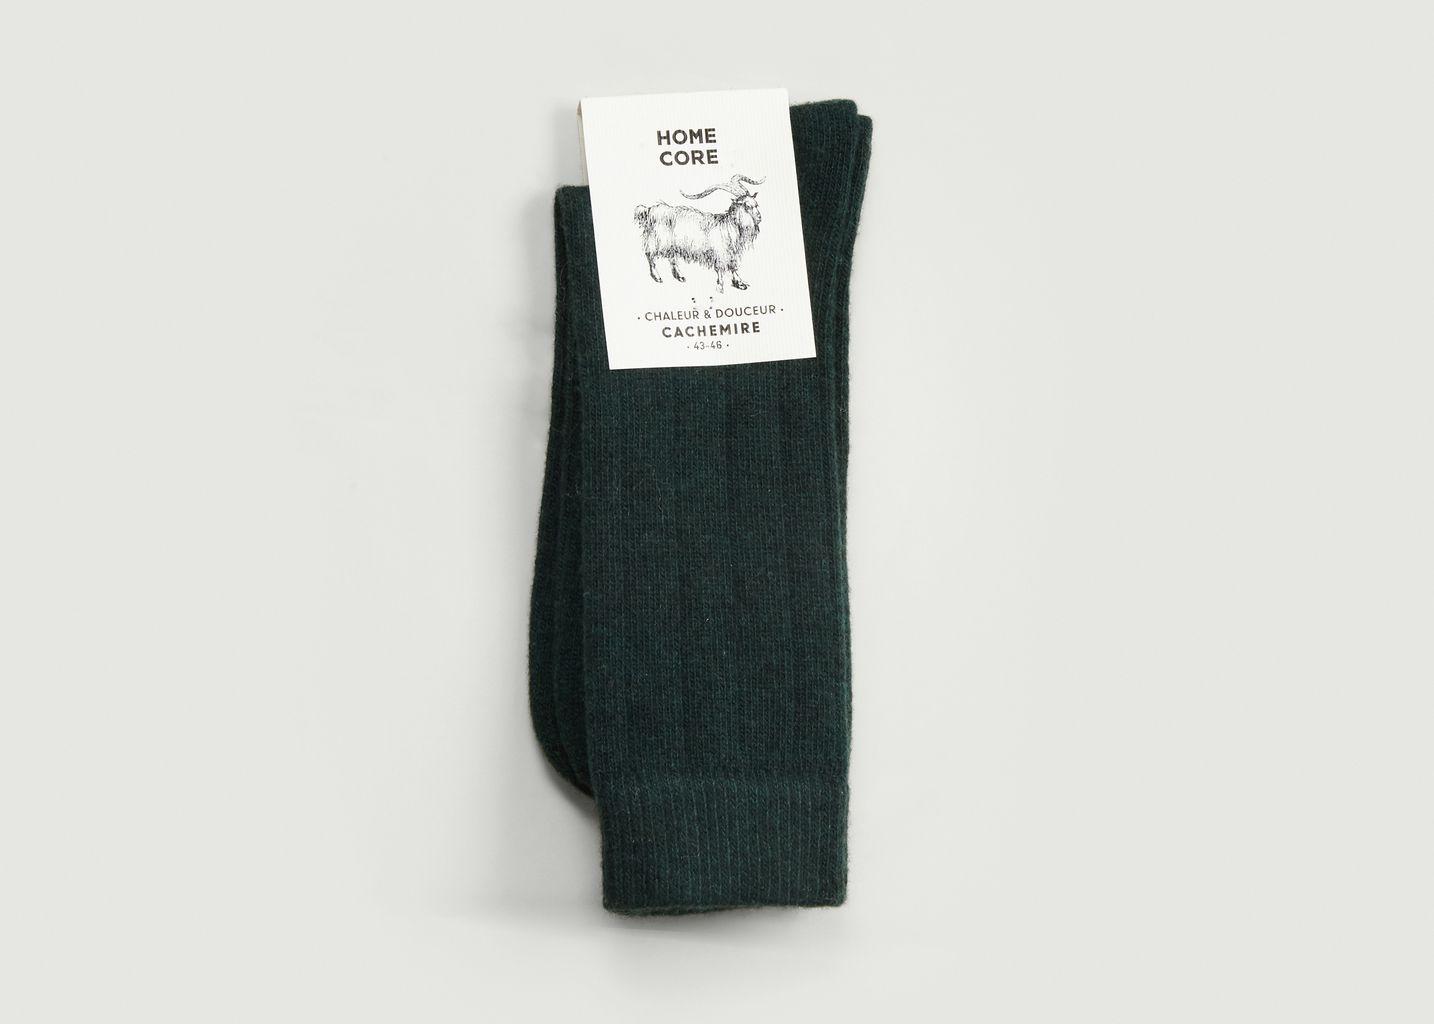 Chaussettes unies - Homecore